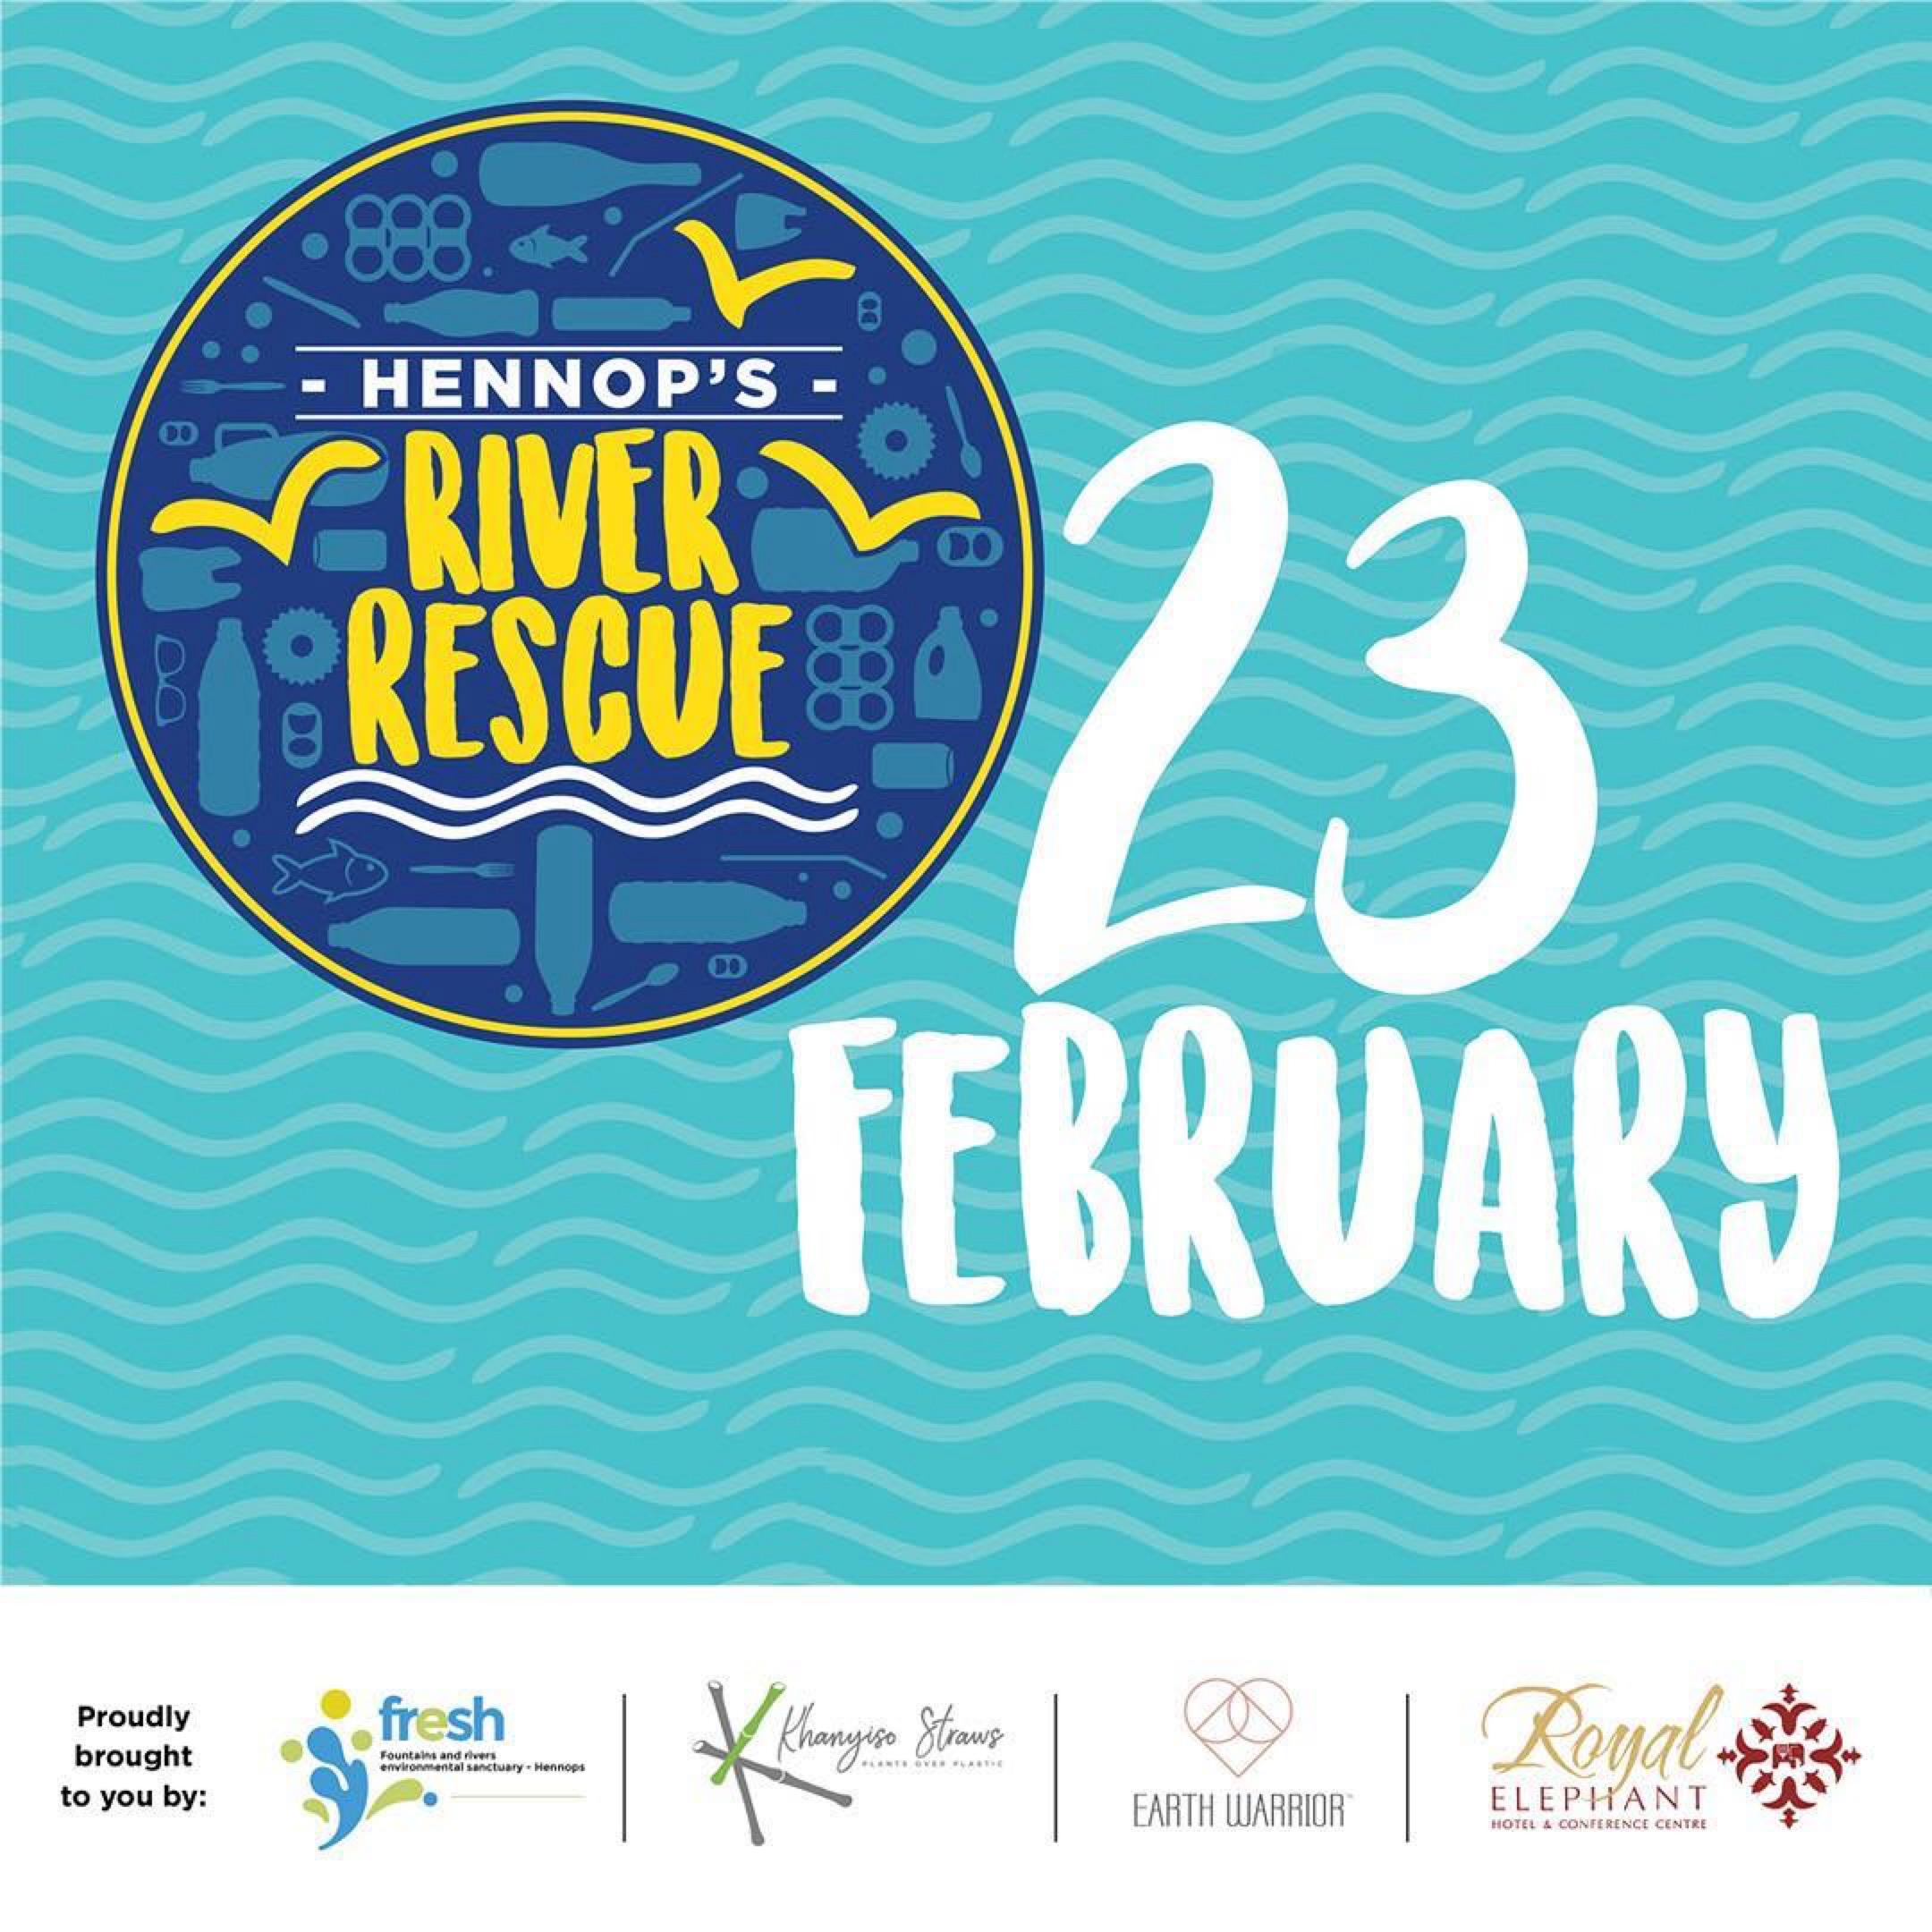 Hennops River Rescue – 23 Feb 2019